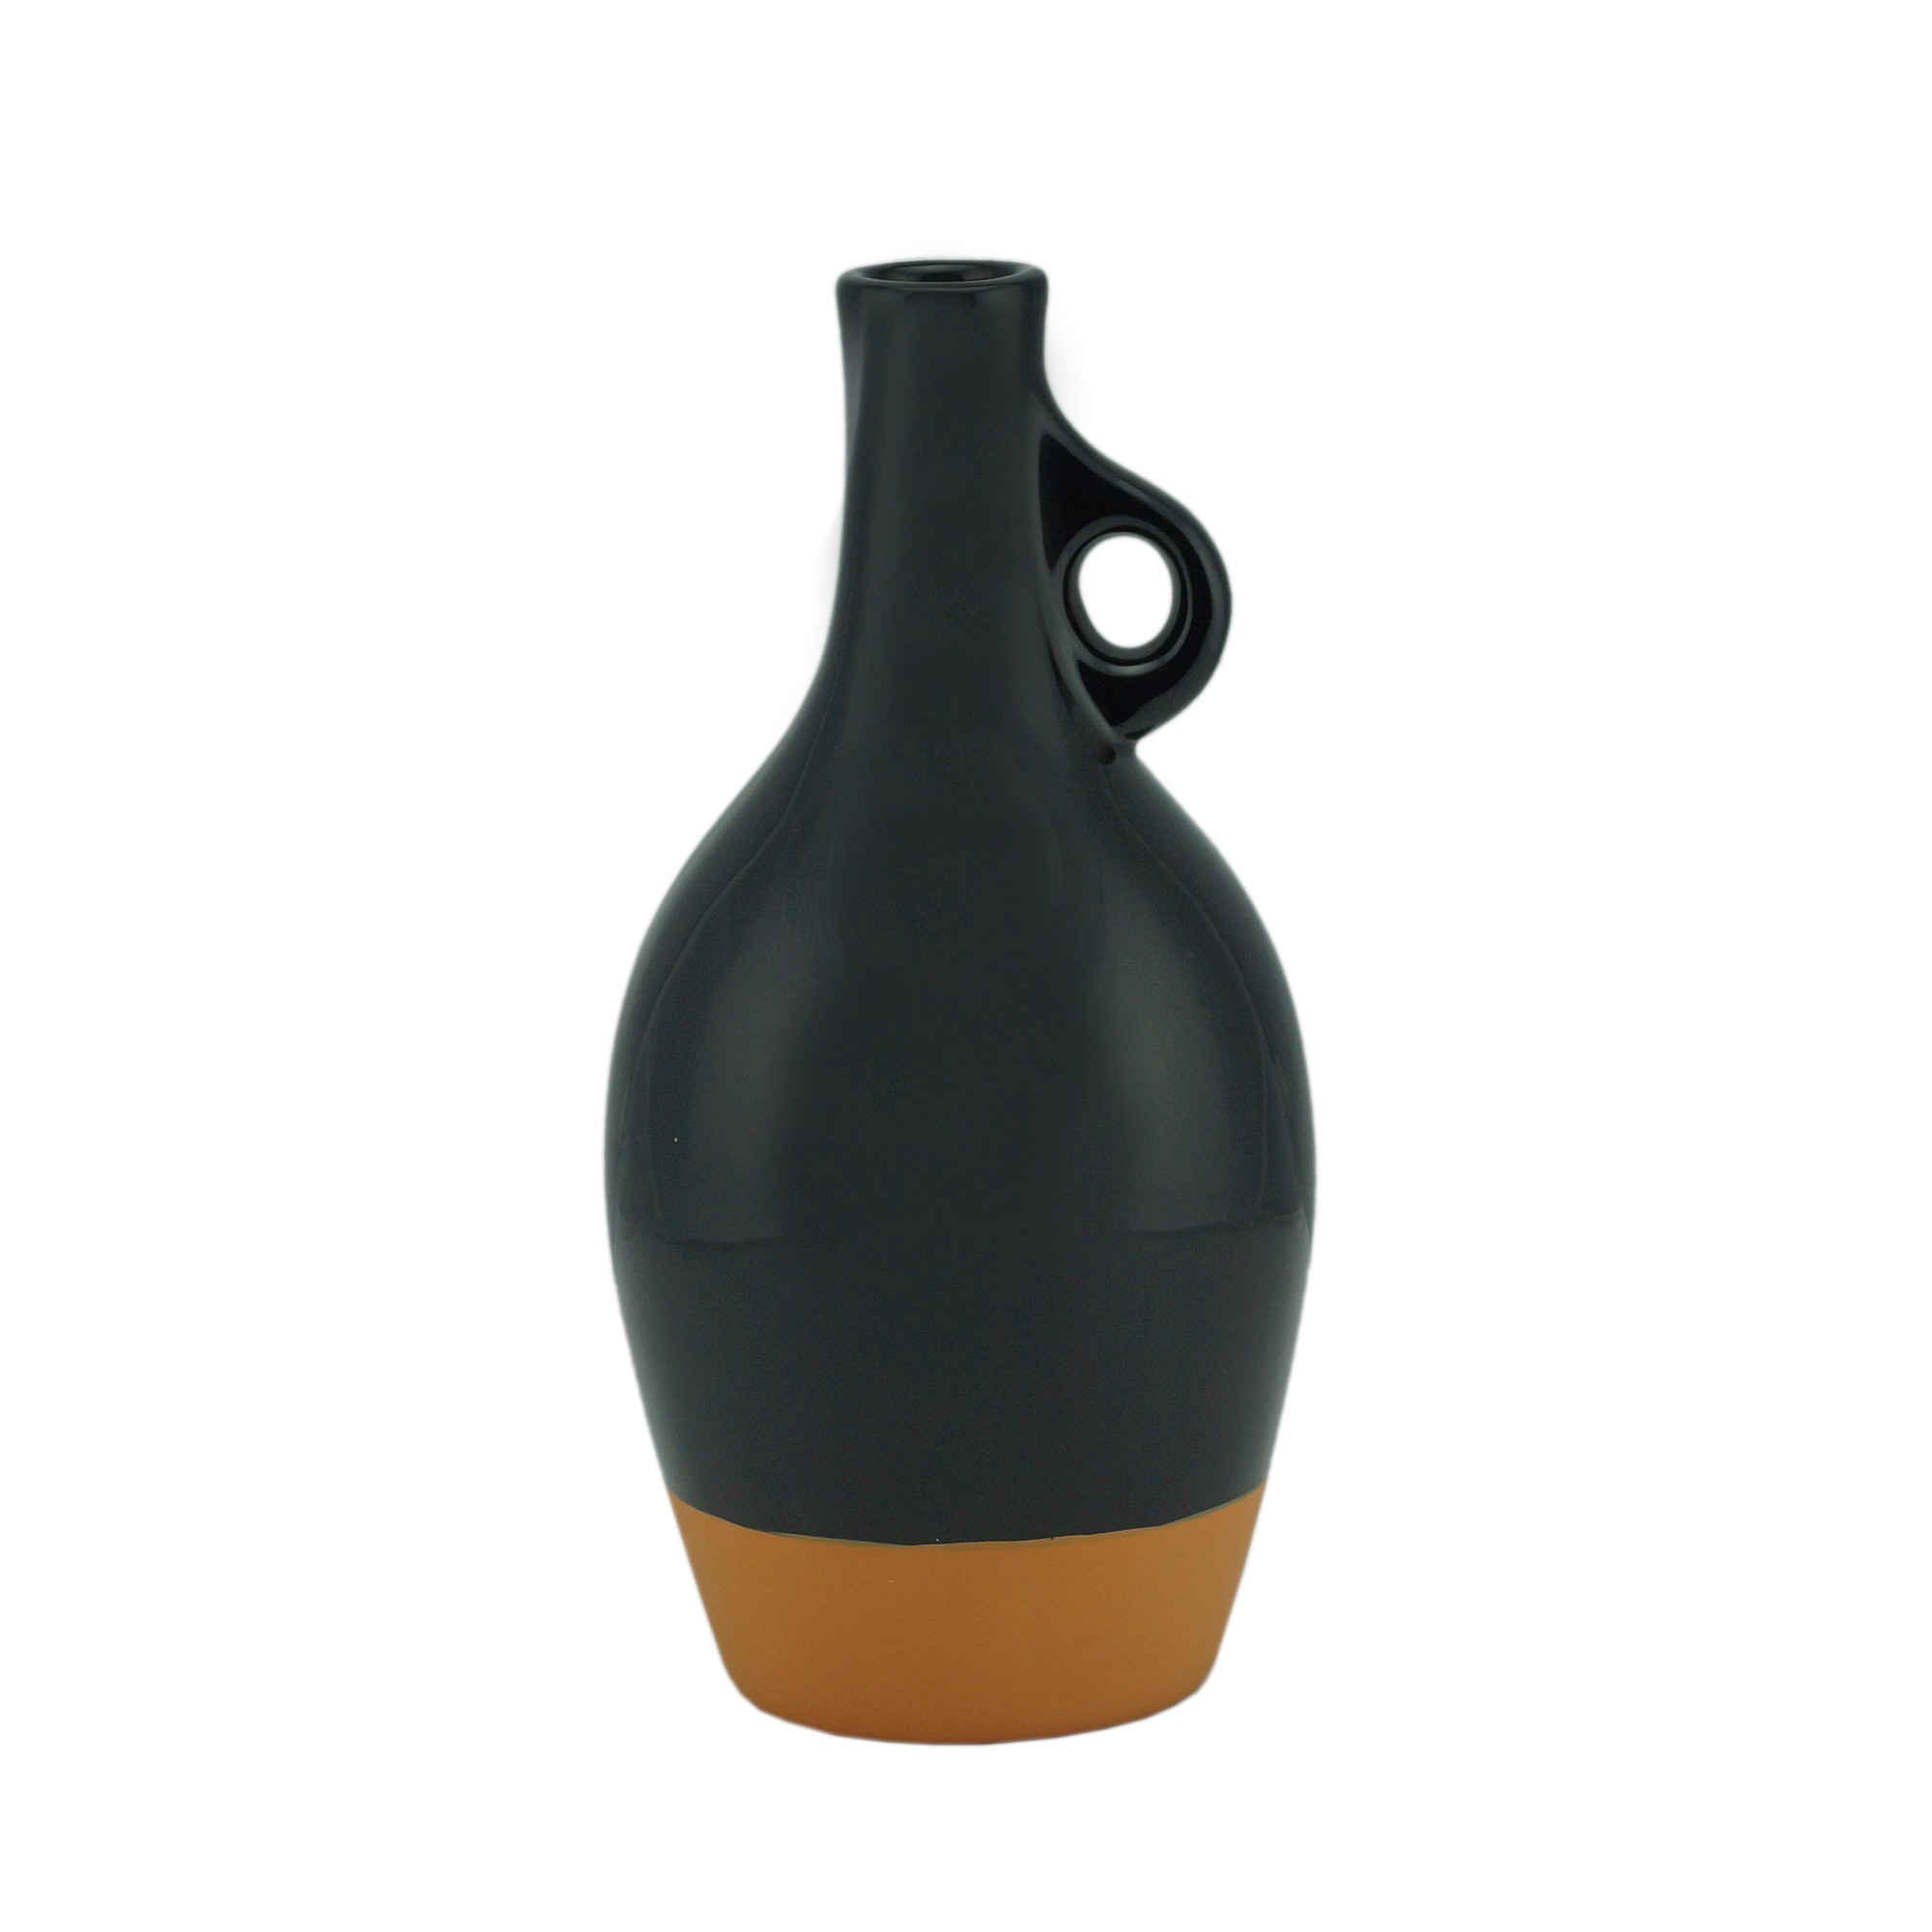 Vaso Decorativo Ceramica 22cm Preto - Urban